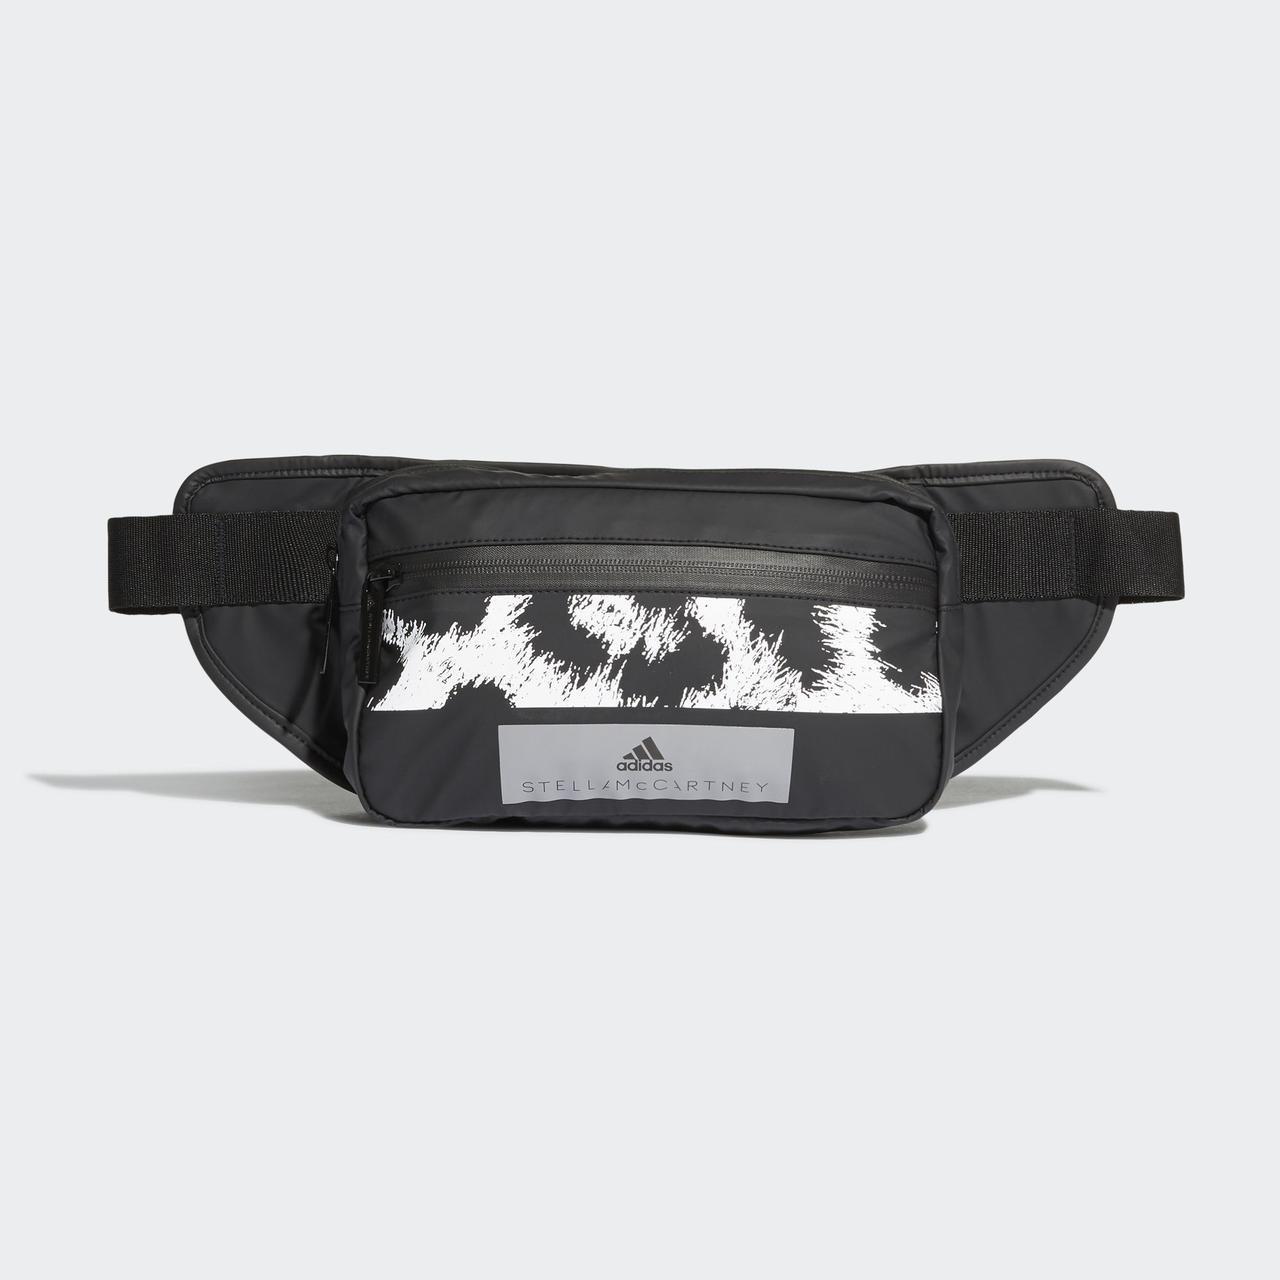 473fb3b399fe Сумка на пояс Adidas Bum Bag DW9313 - 2019: продажа, цена в Киеве ...